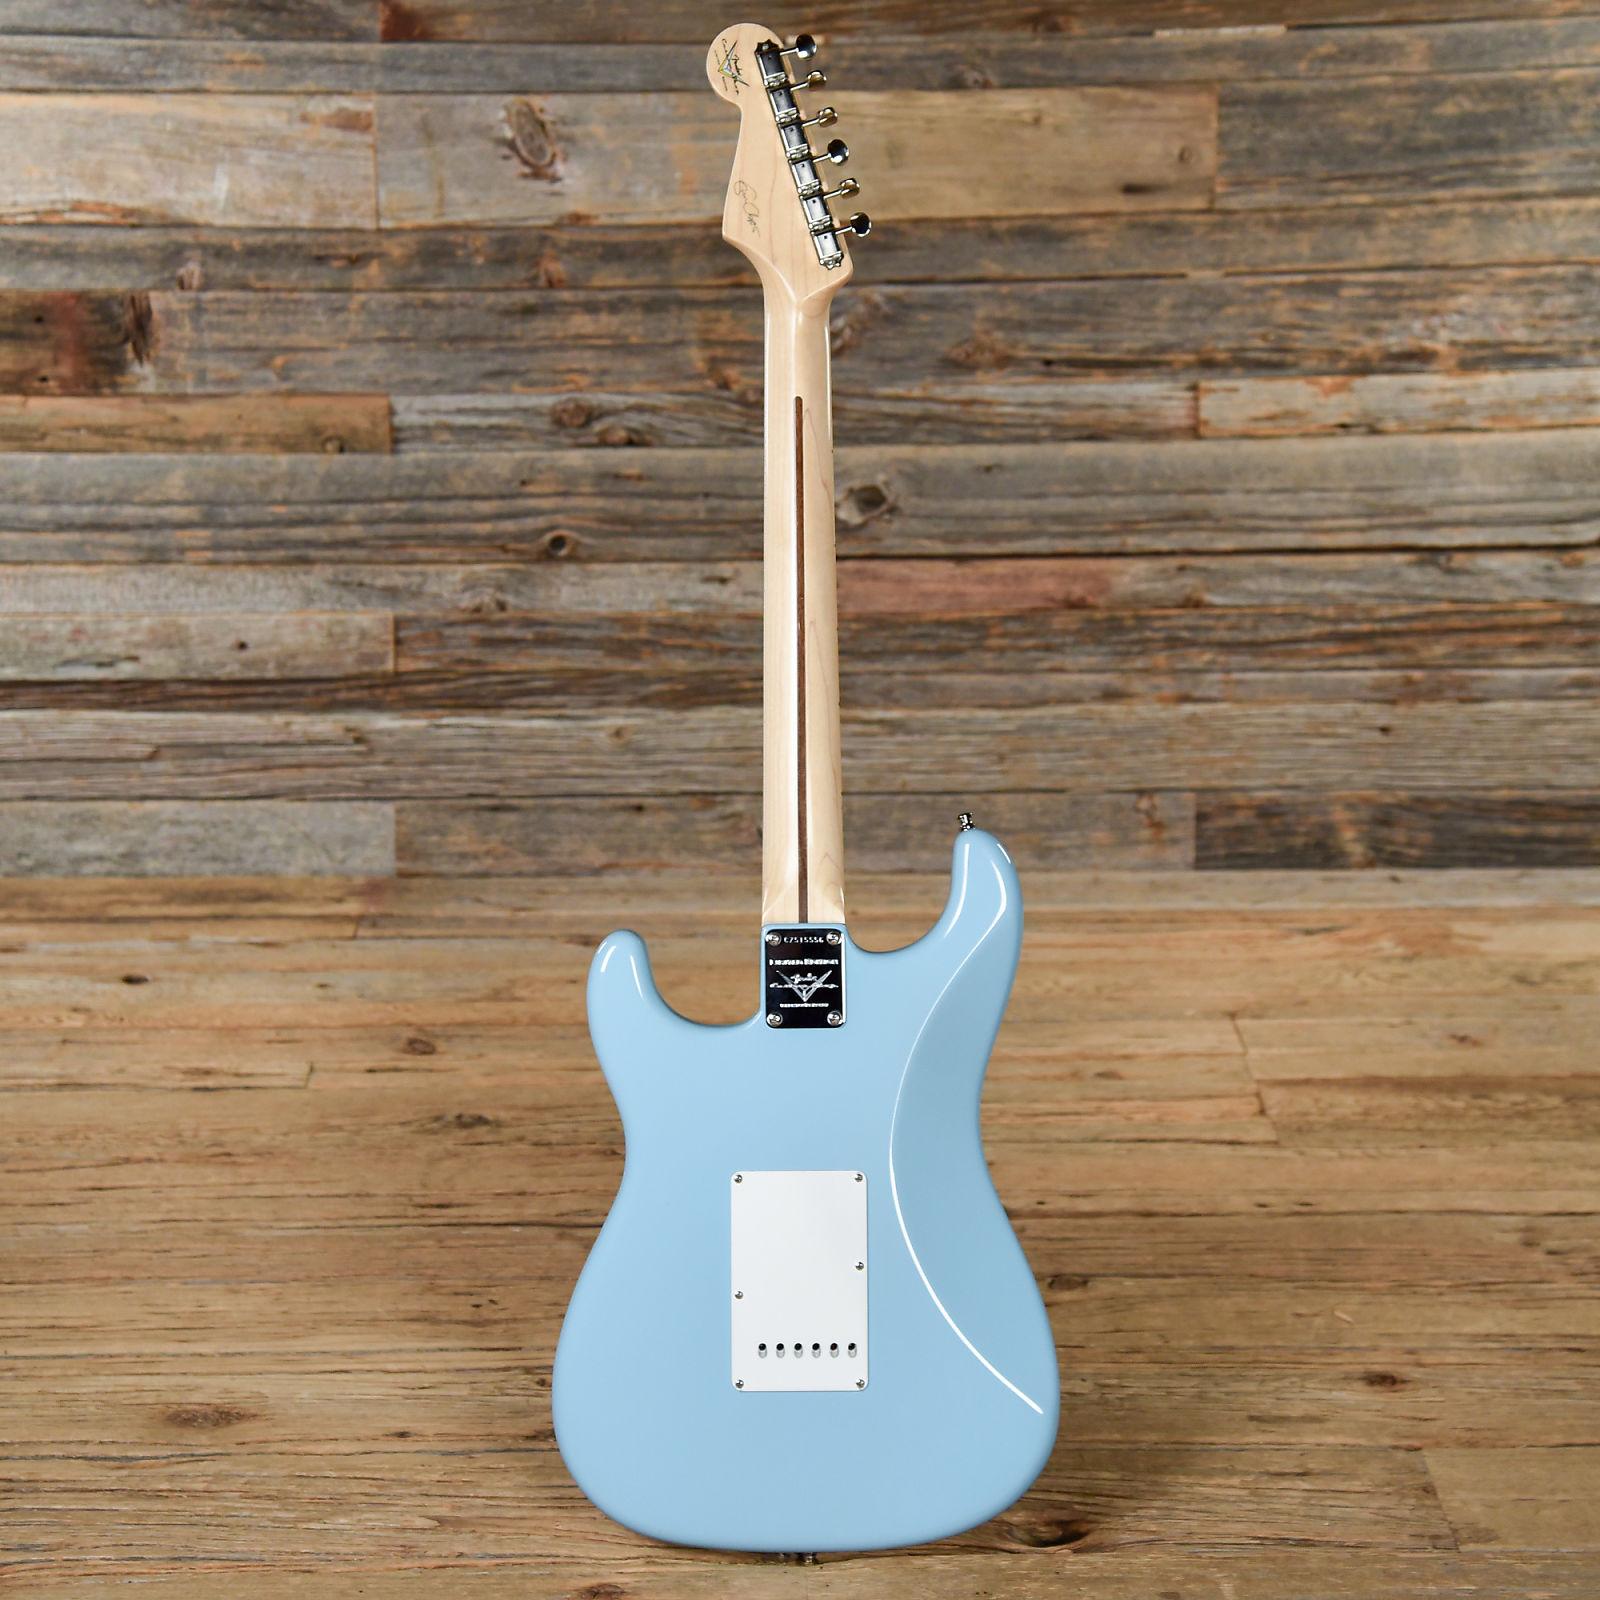 Fender Custom Eric Clapton Signature Stratocaster Daphne Blue 2010 S556